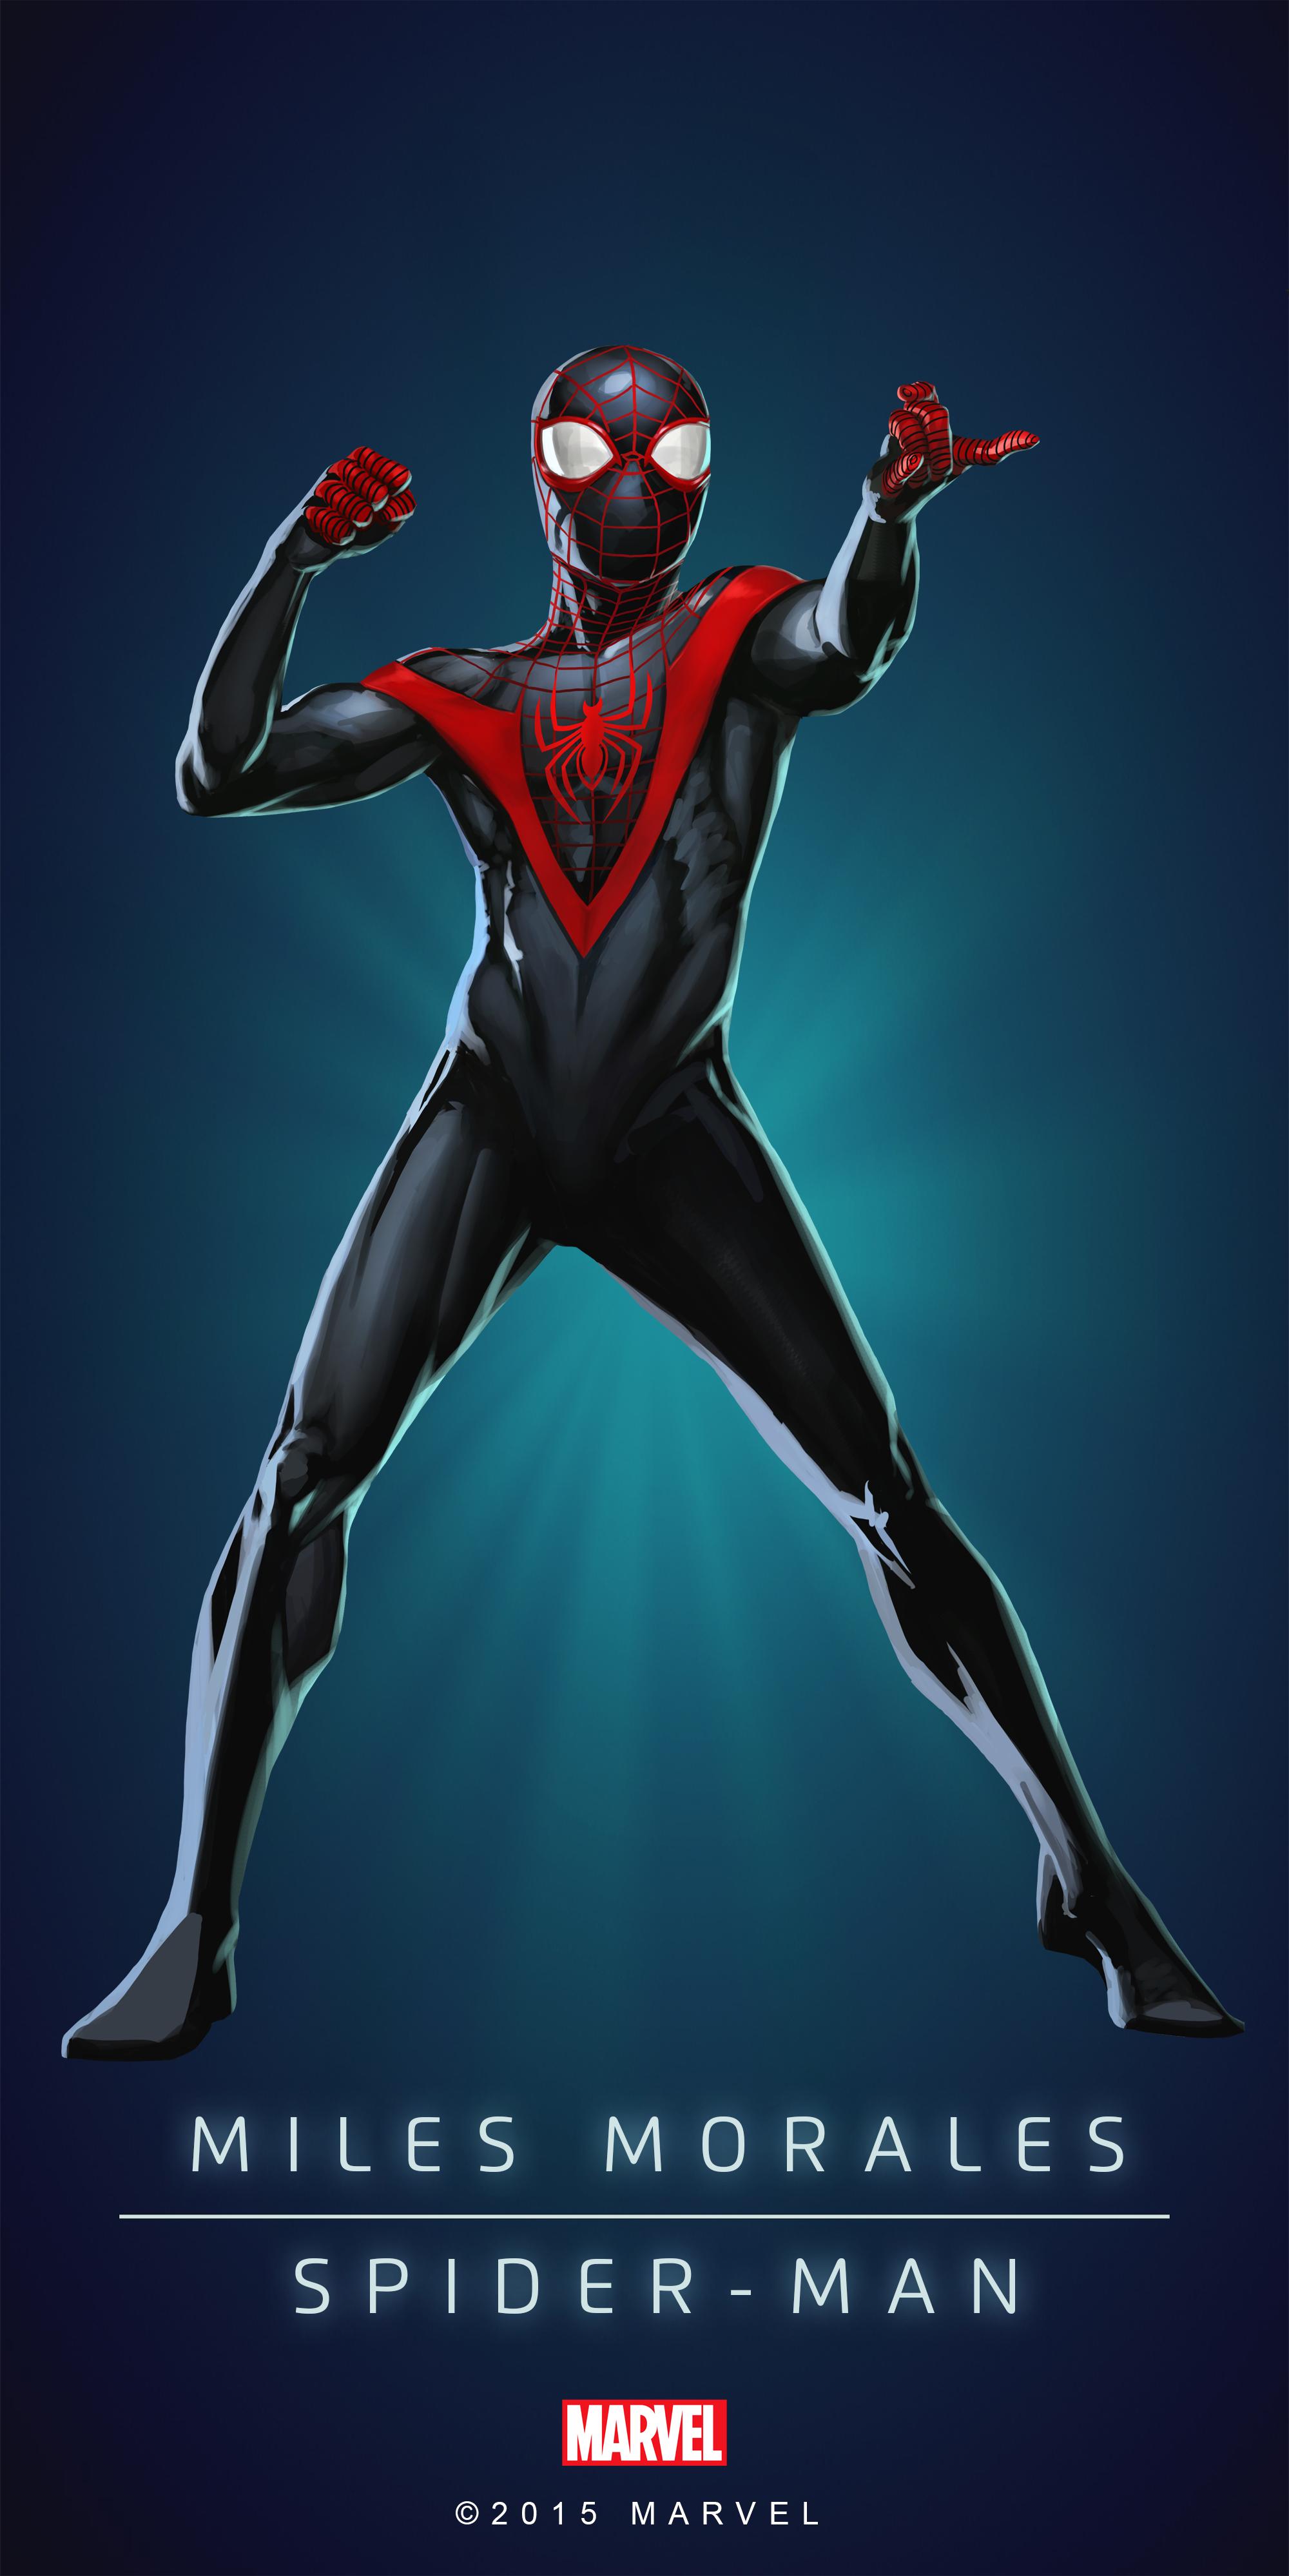 Spider Man Miles Morales Poster 02